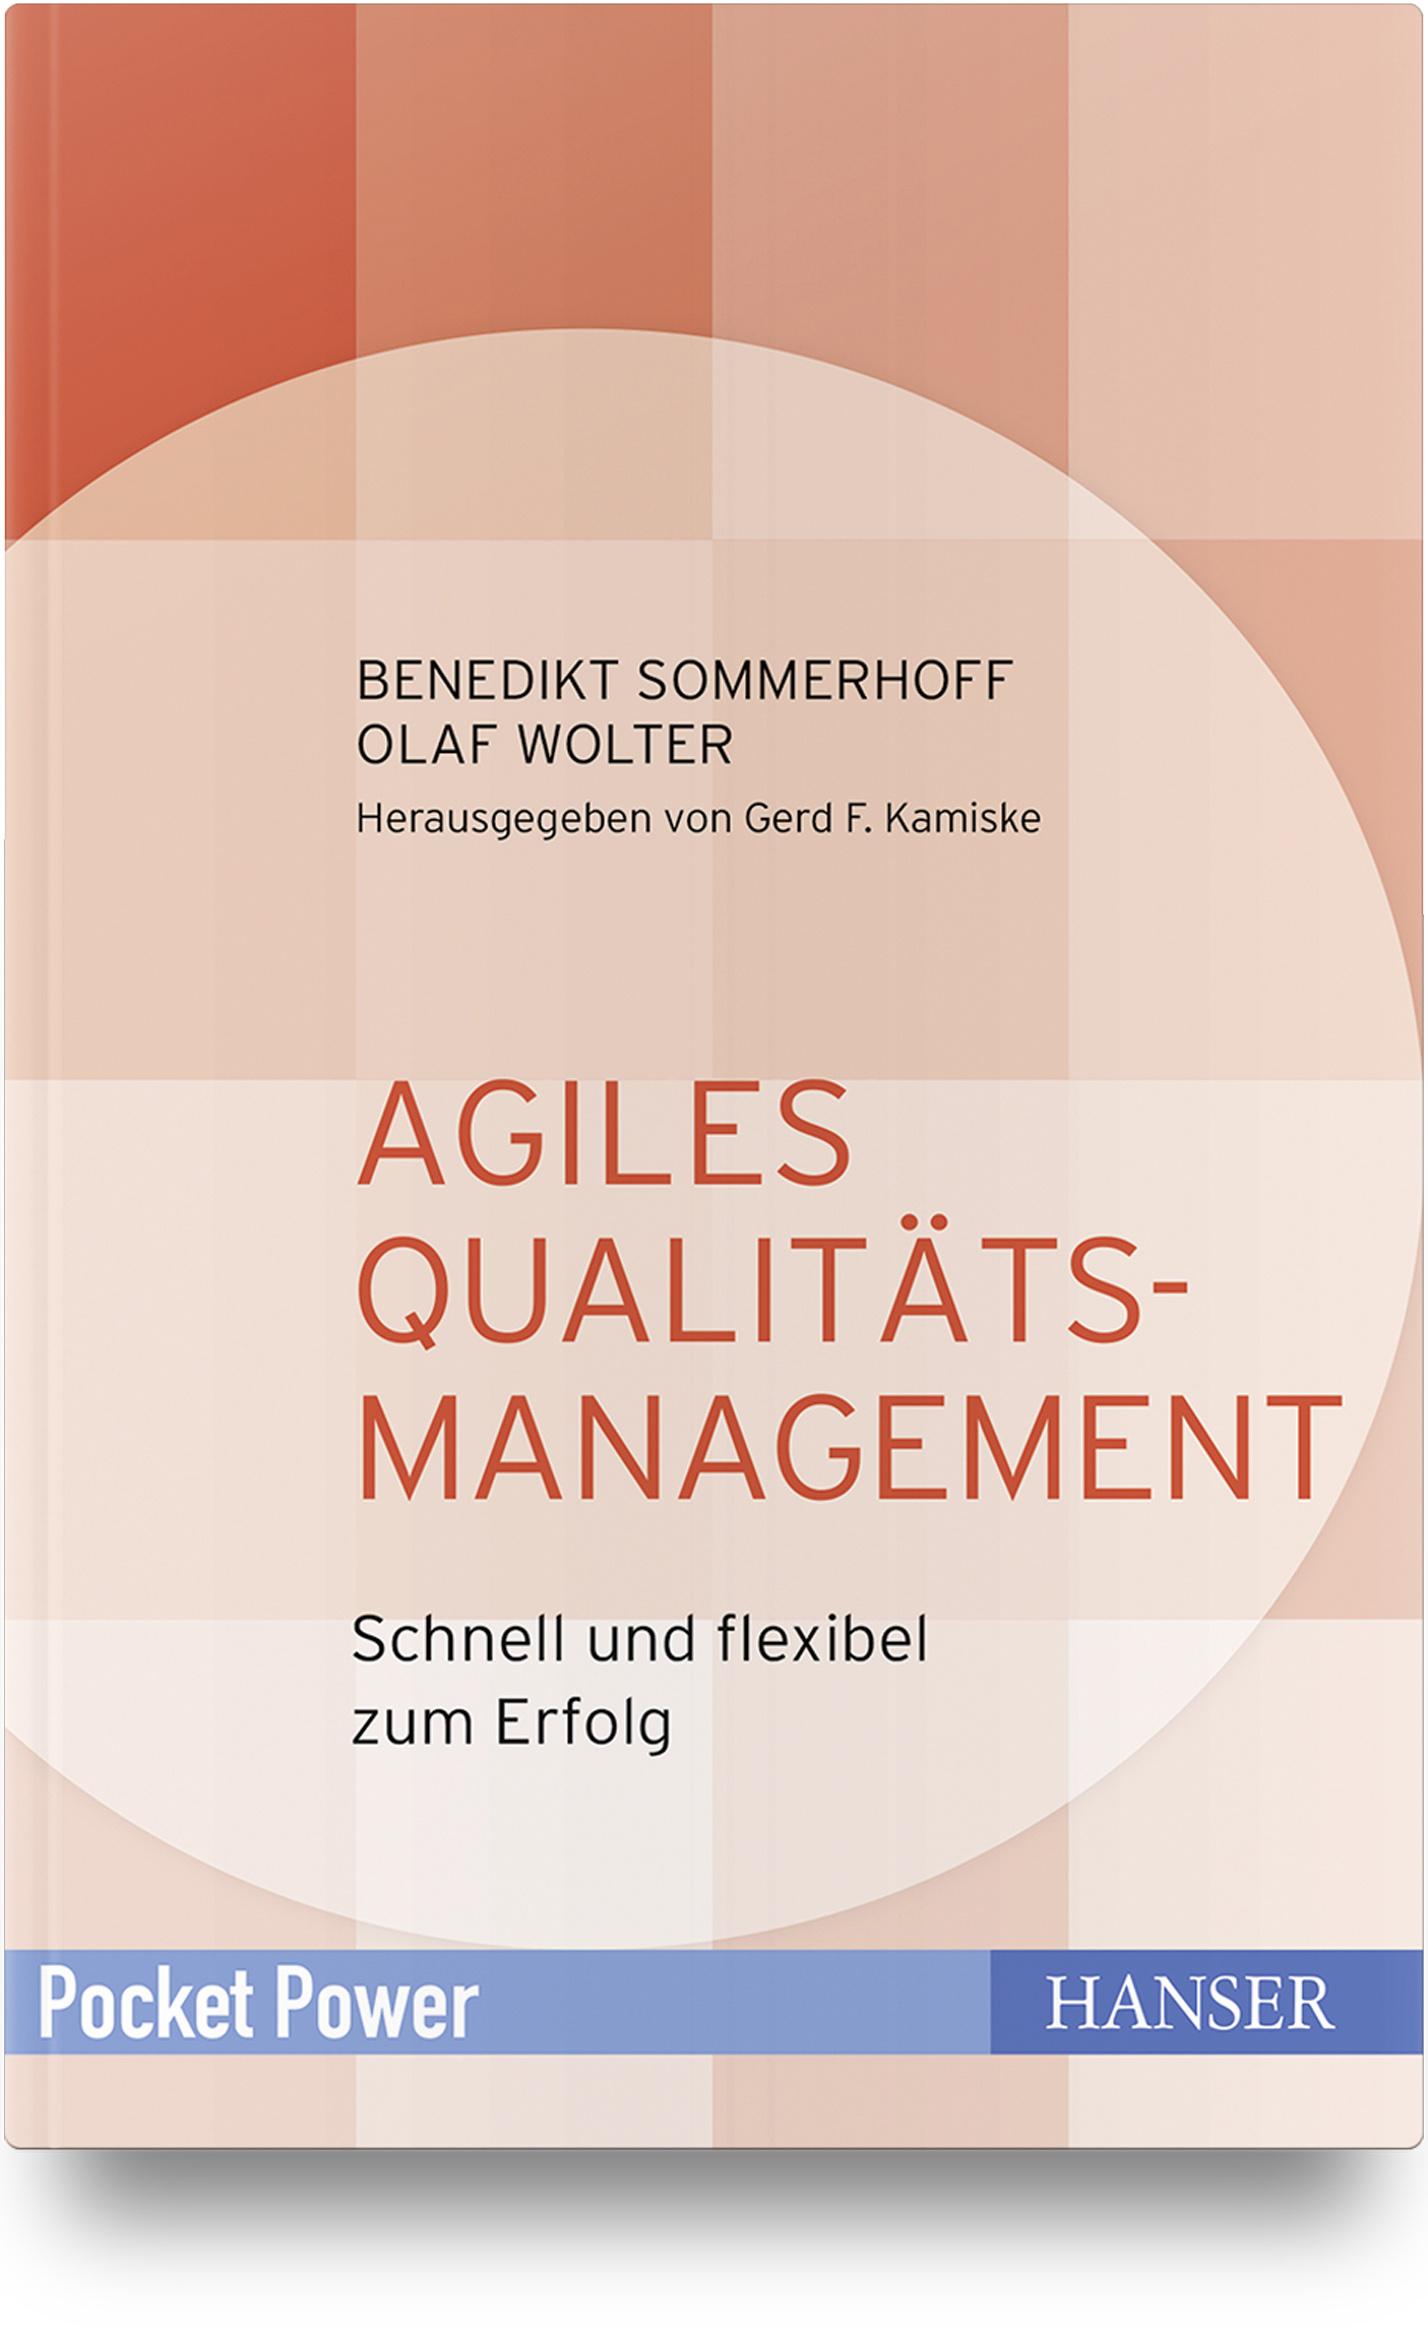 Sommerhoff, Wolter, Agiles Qualitätsmanagement, 978-3-446-45574-0